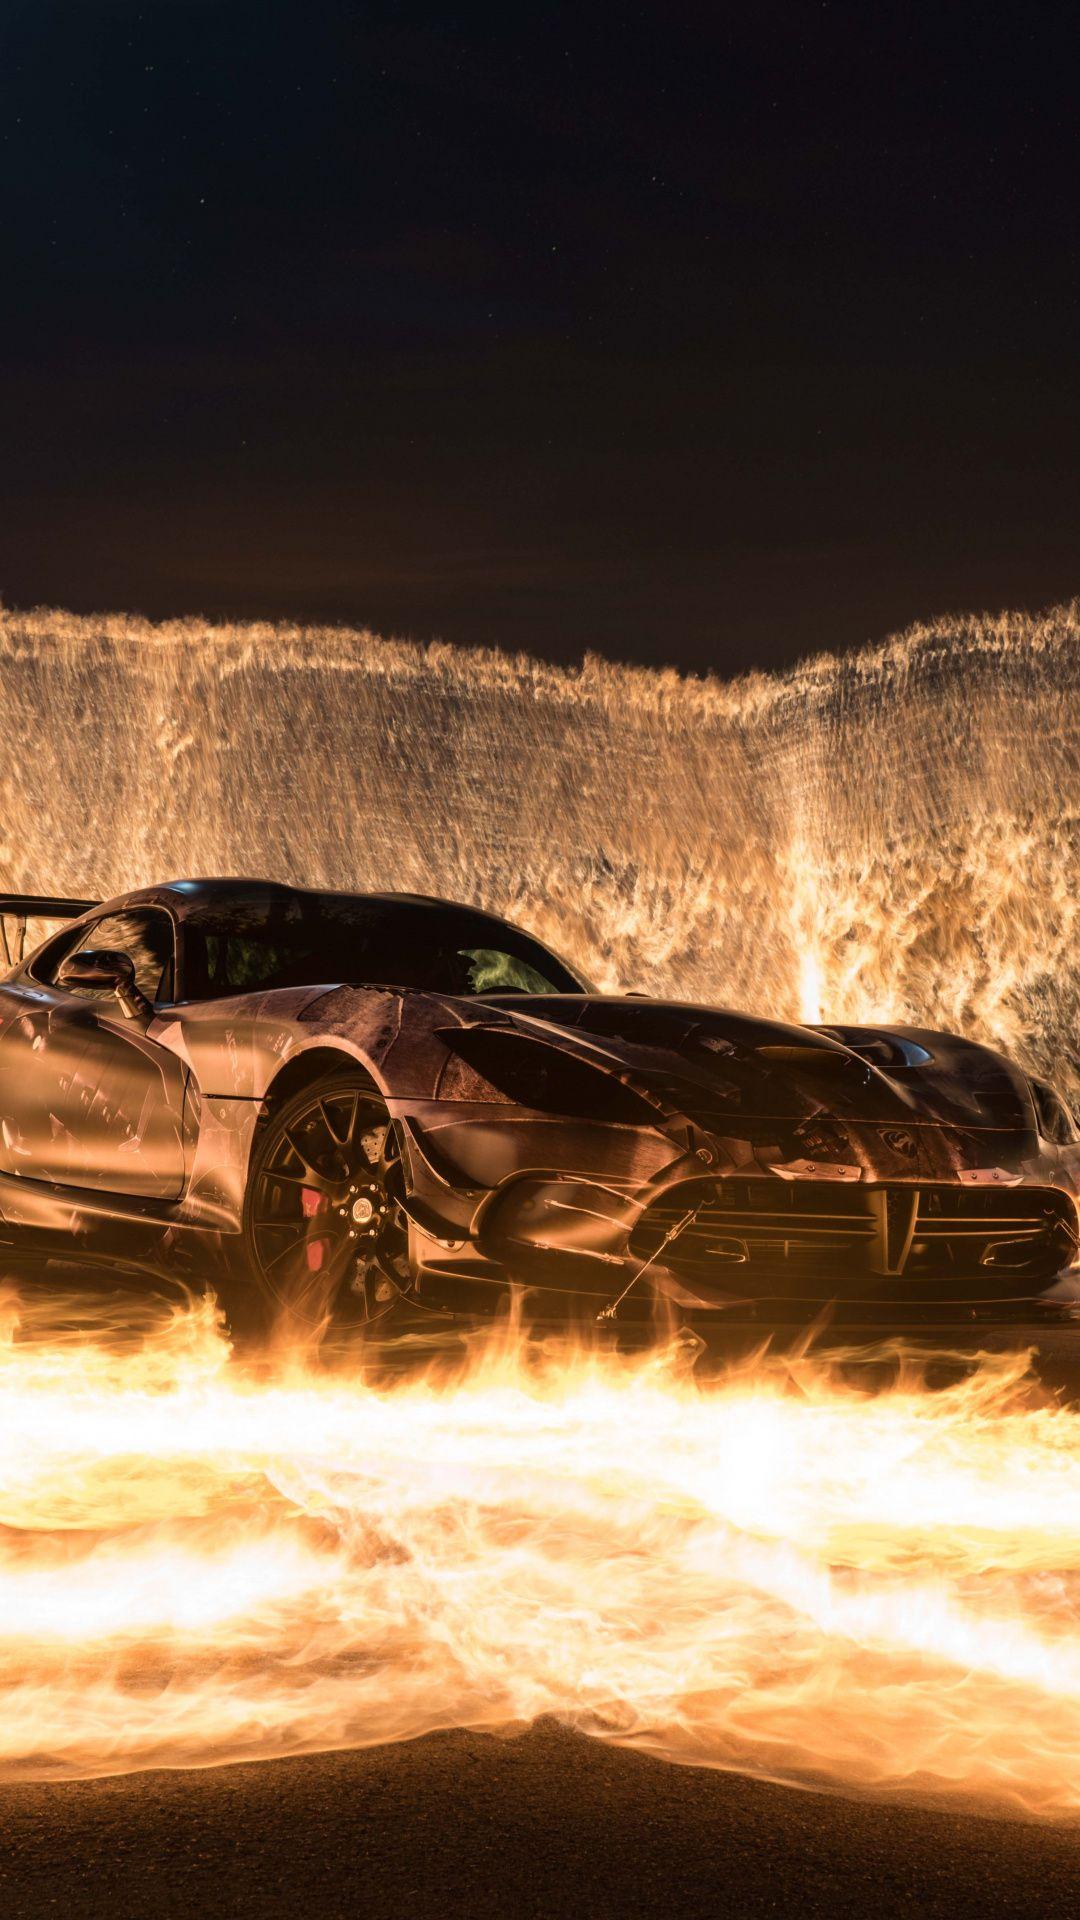 Downaload Sports car, car on fire wallpaper for screen